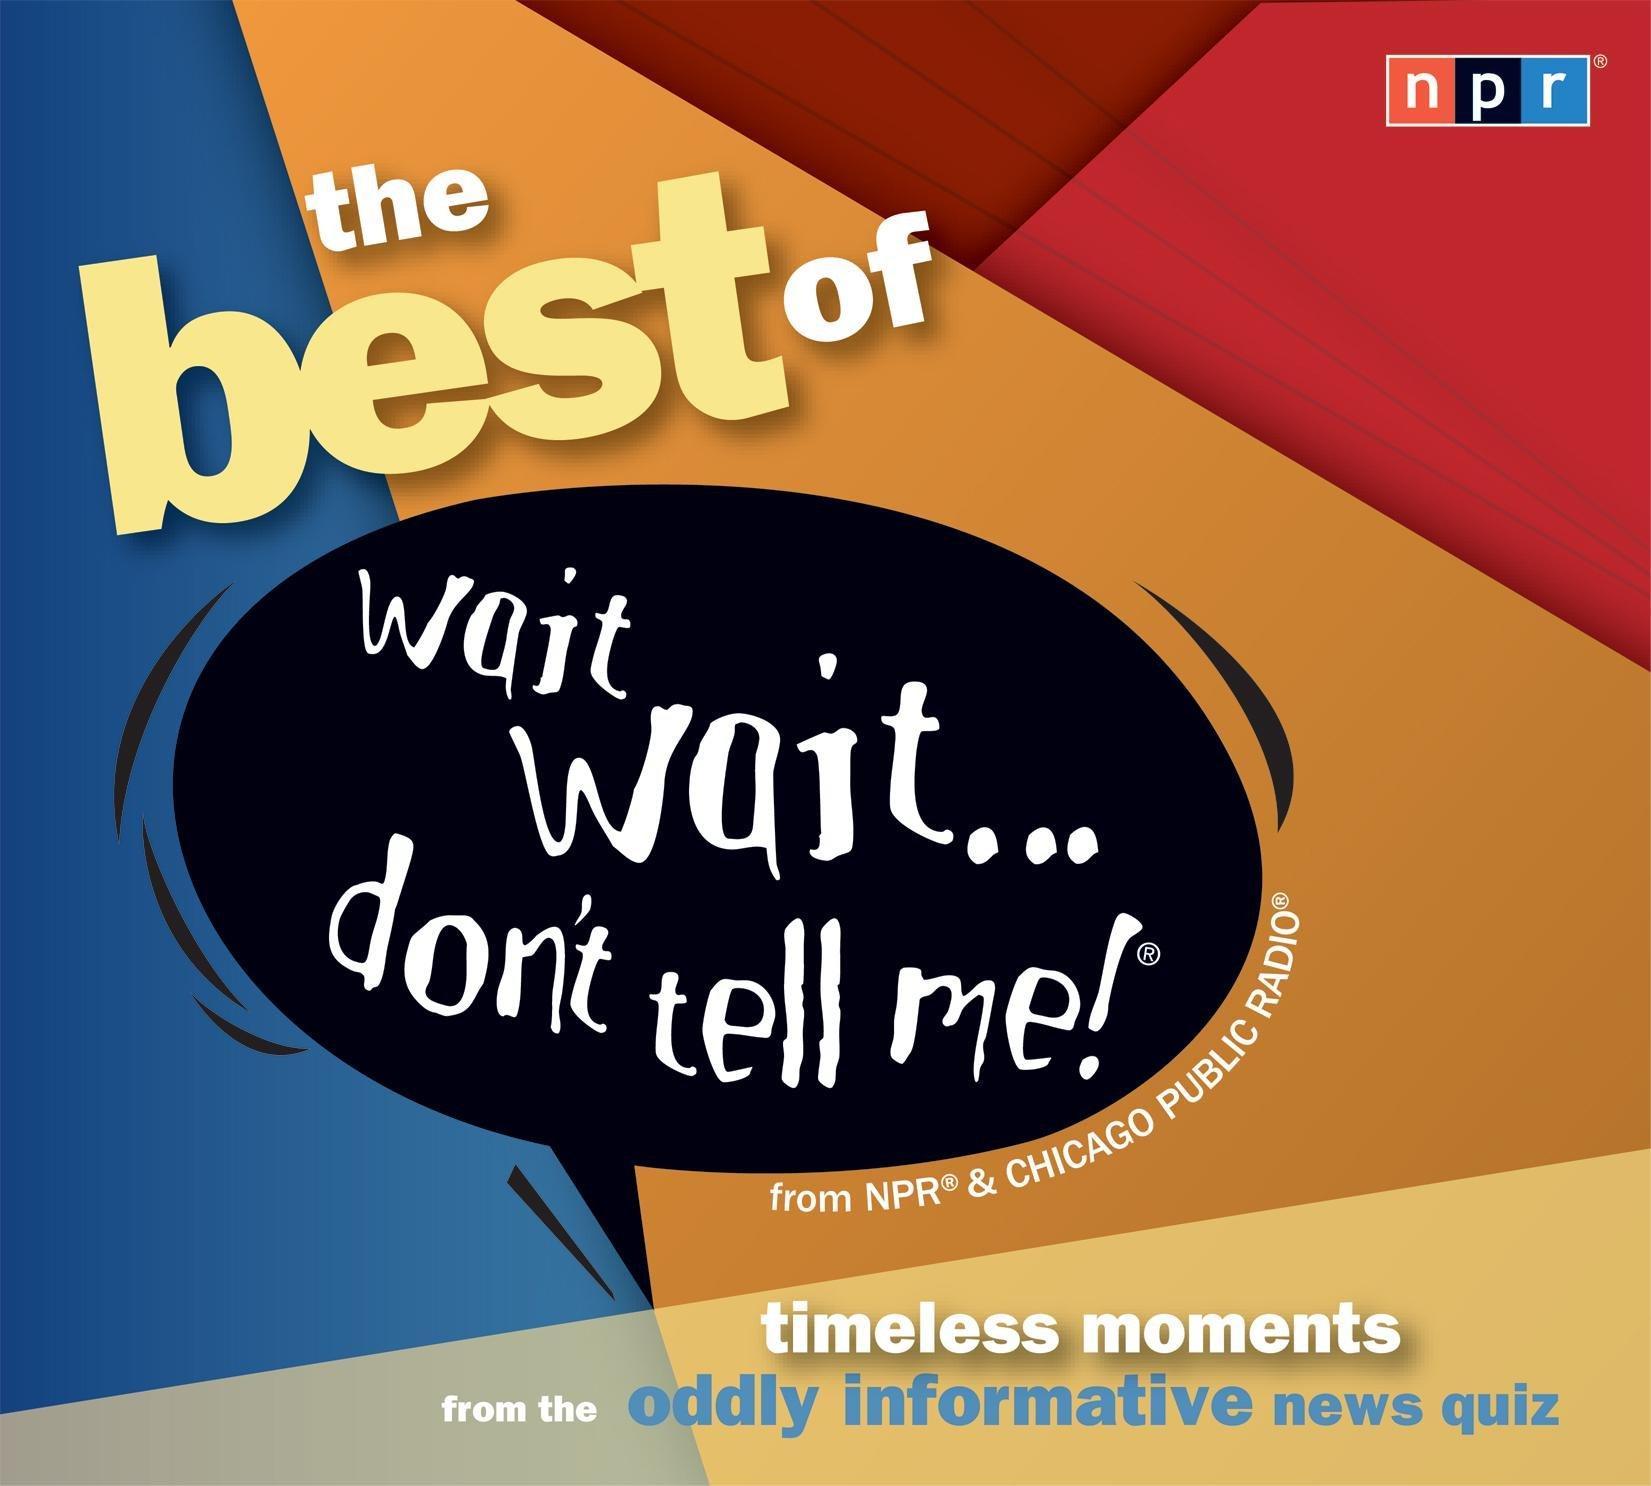 The Best of Wait Wait...Don't Tell Me! (NPR): Carl Kasell, Peter Sagal, Mo  Rocca, Roy Blount Jr, Tom Bodett, PJ O'Rourke, Paula Poundstone, Paul  Provenza: ...